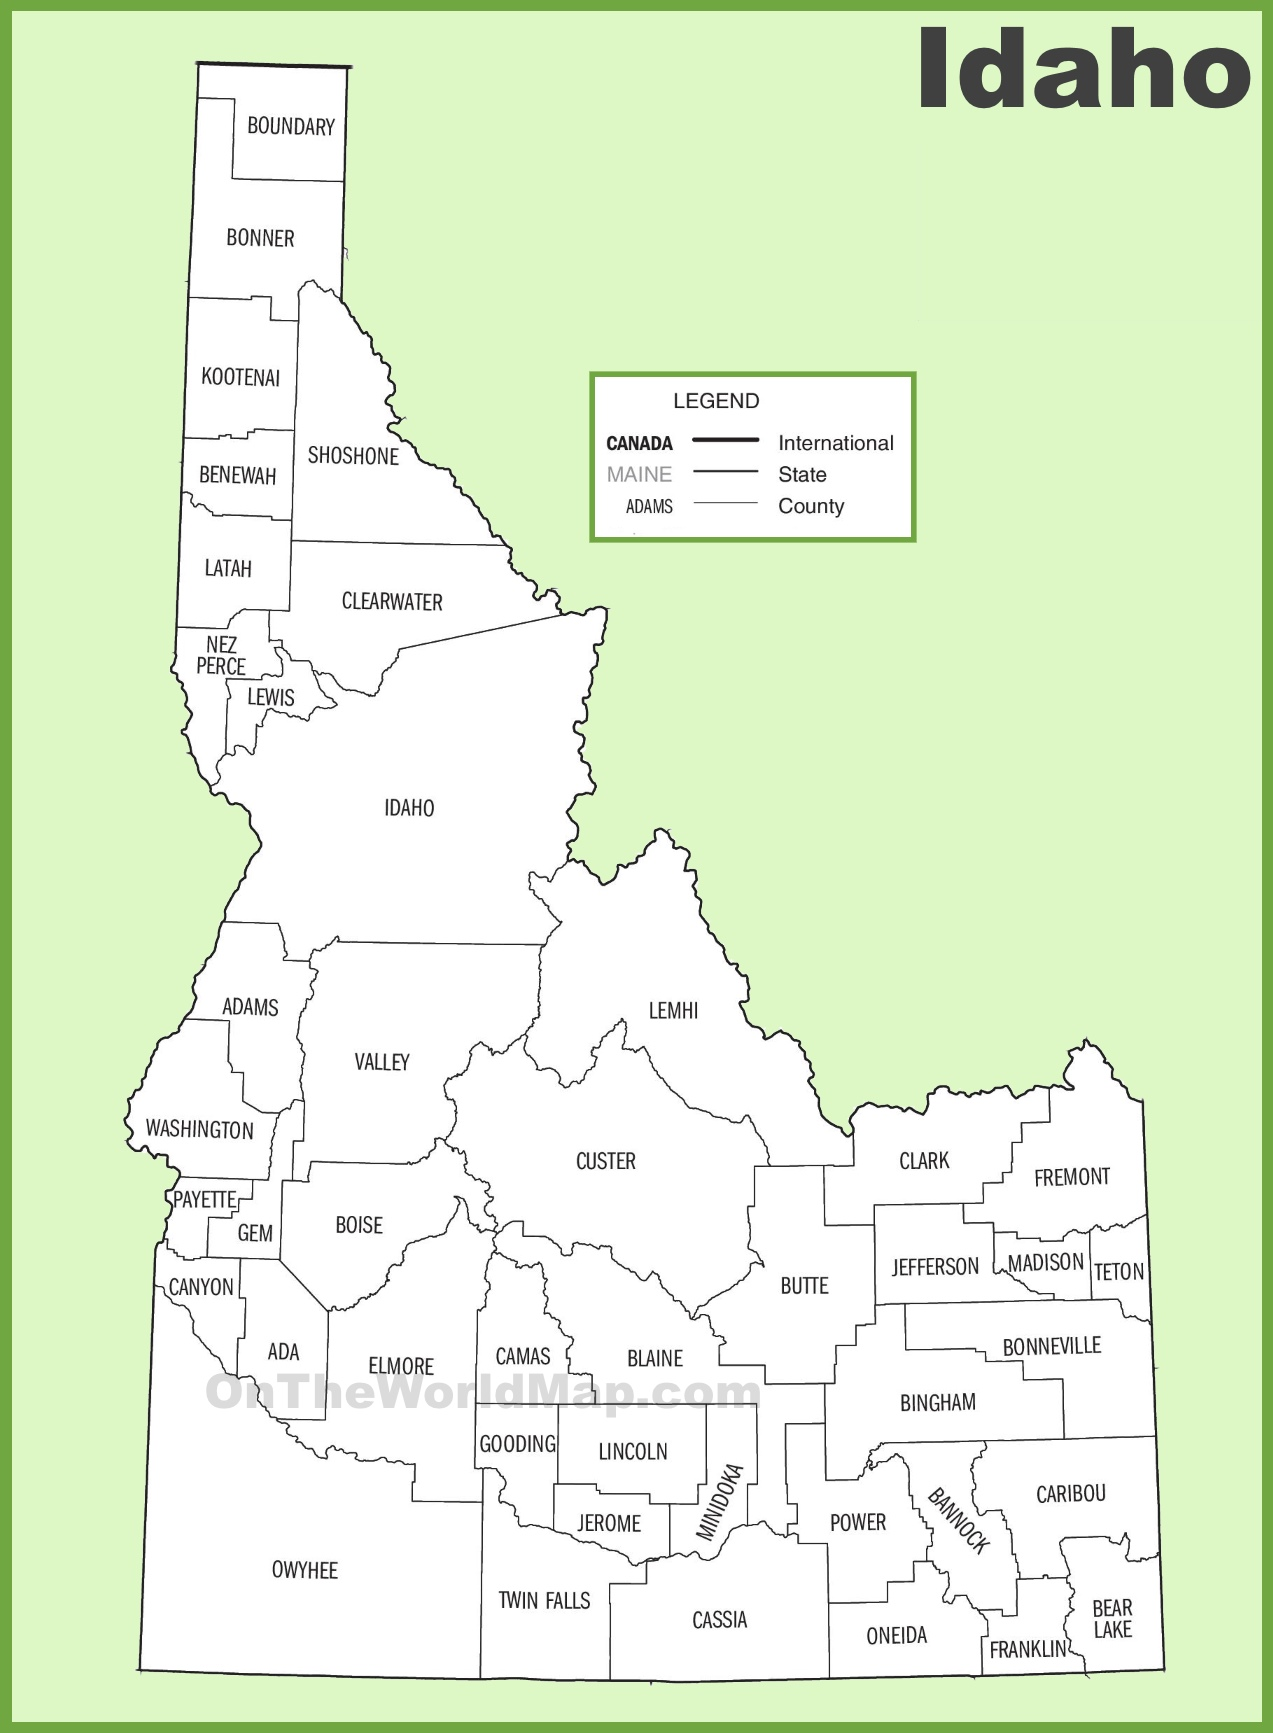 Idaho County Map Idaho county map Idaho County Map